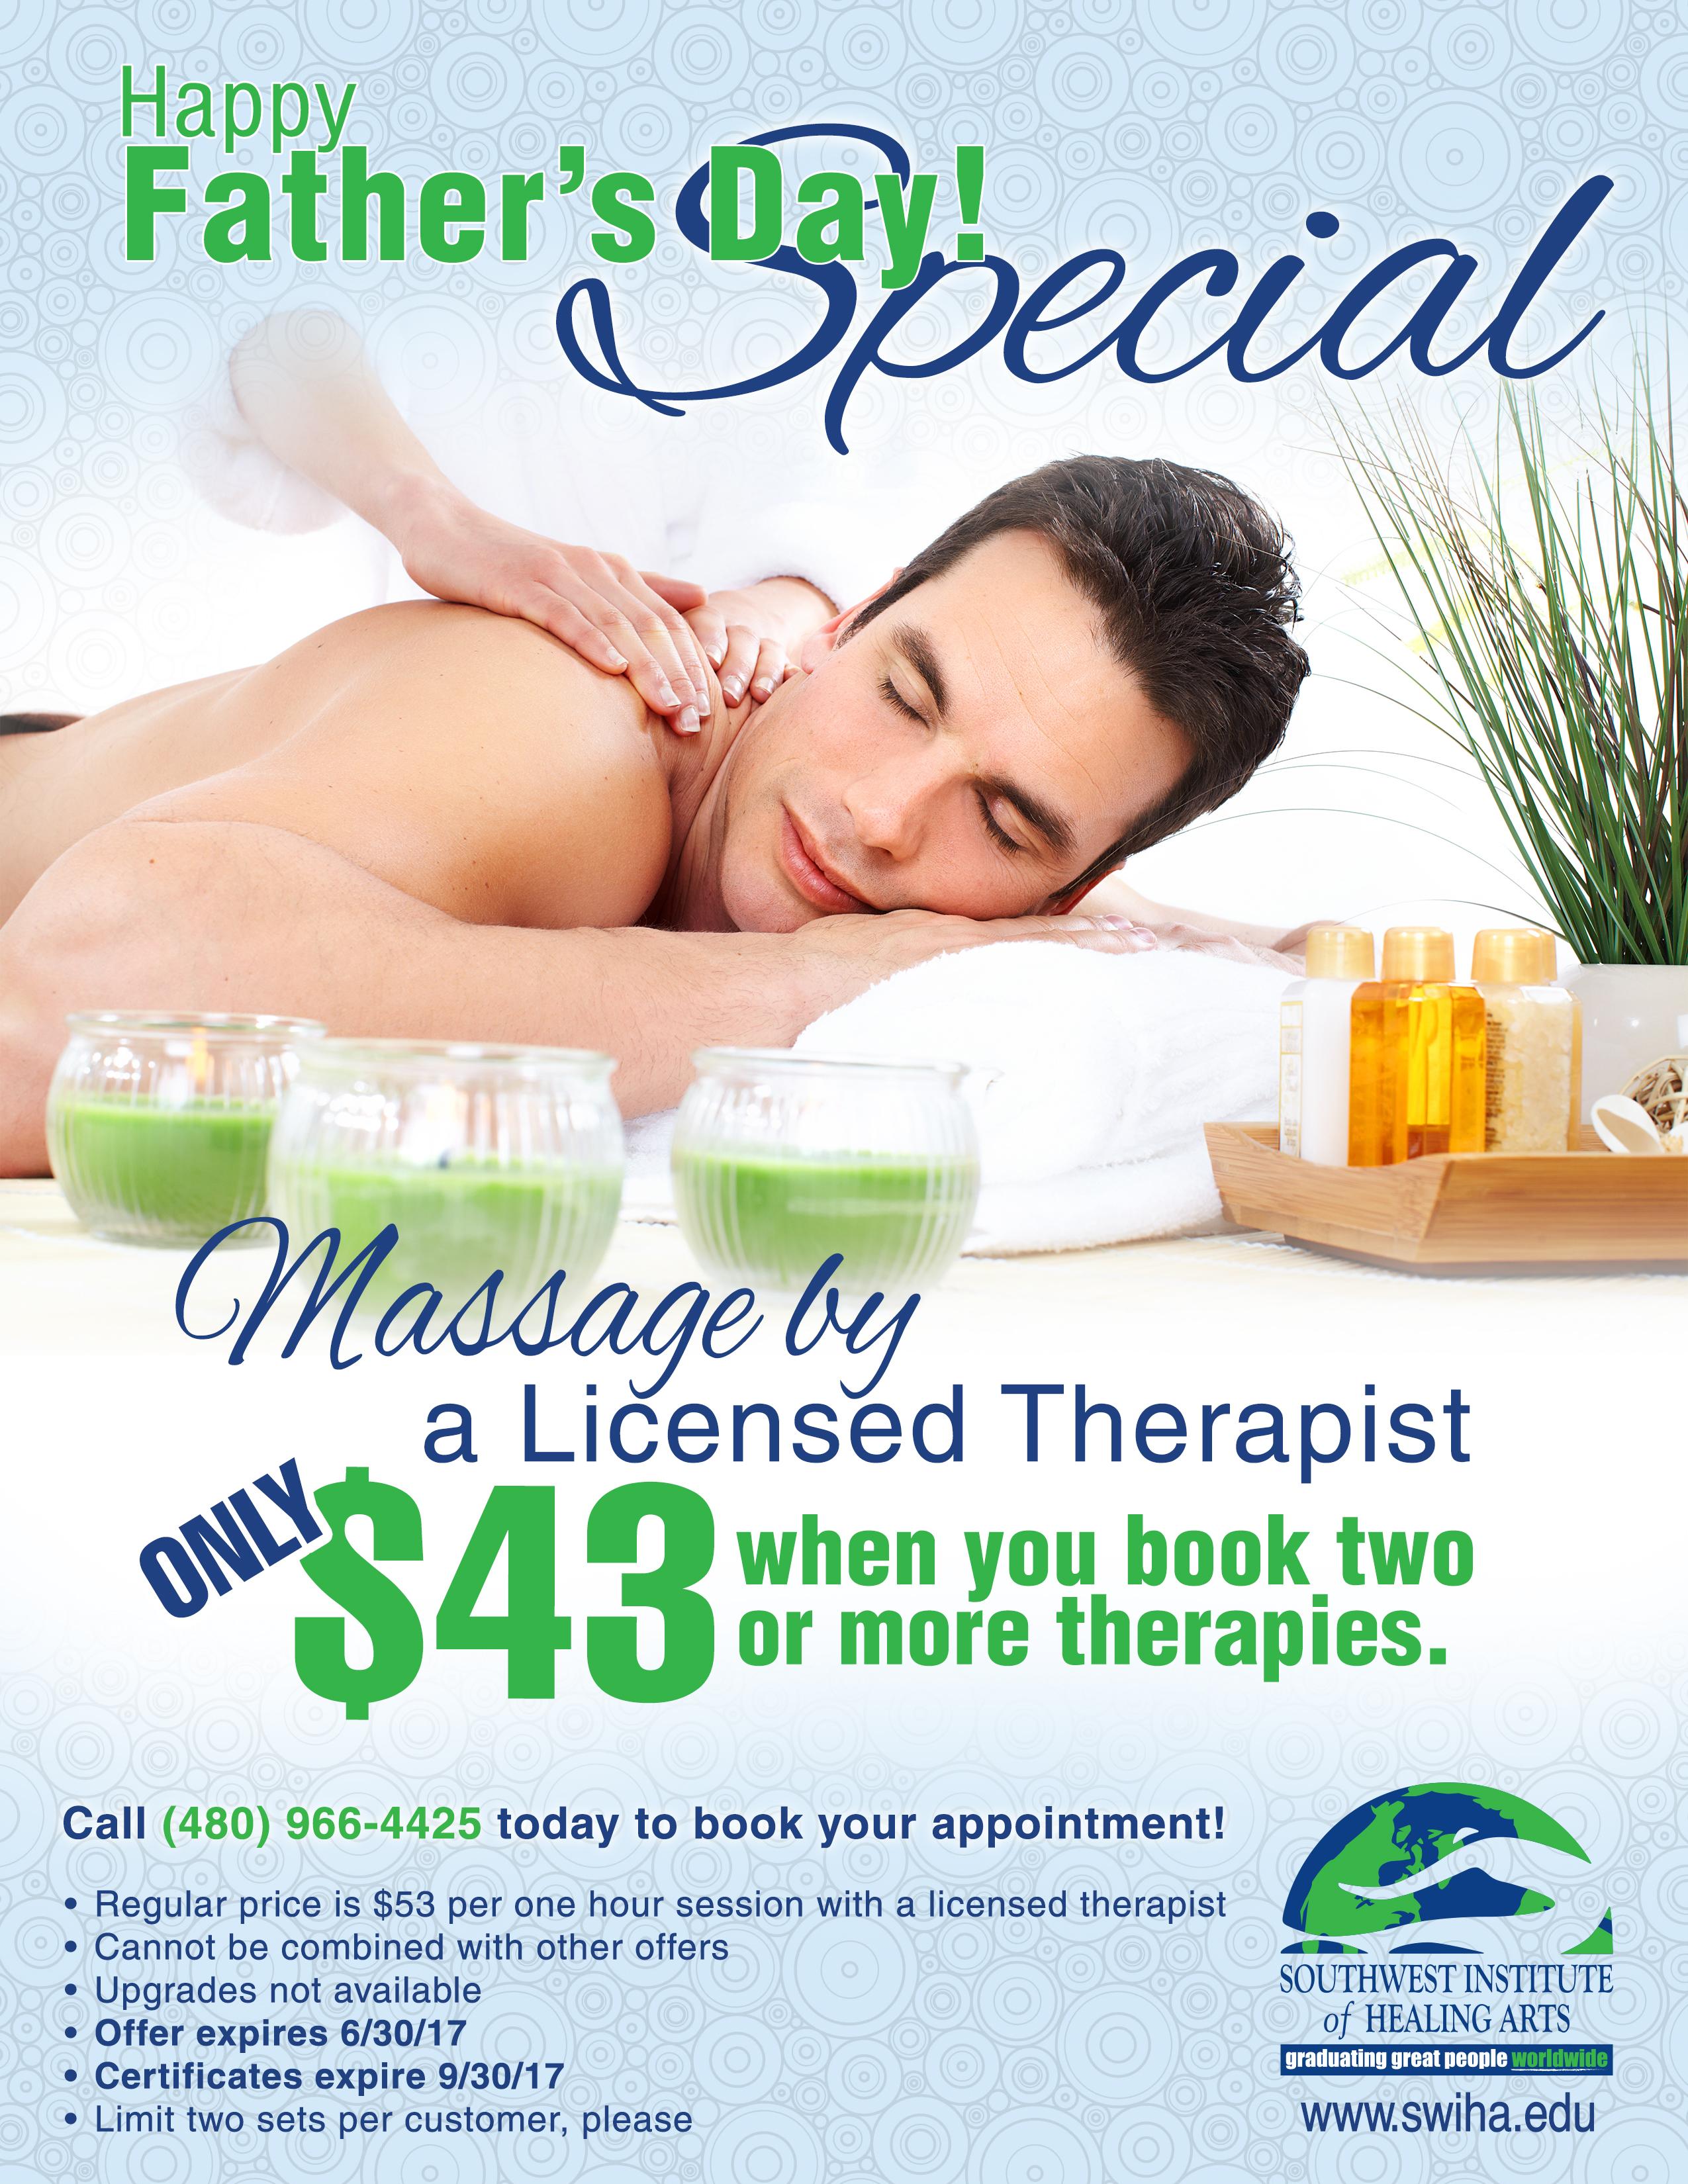 SWIHA Massage Clinic June Special